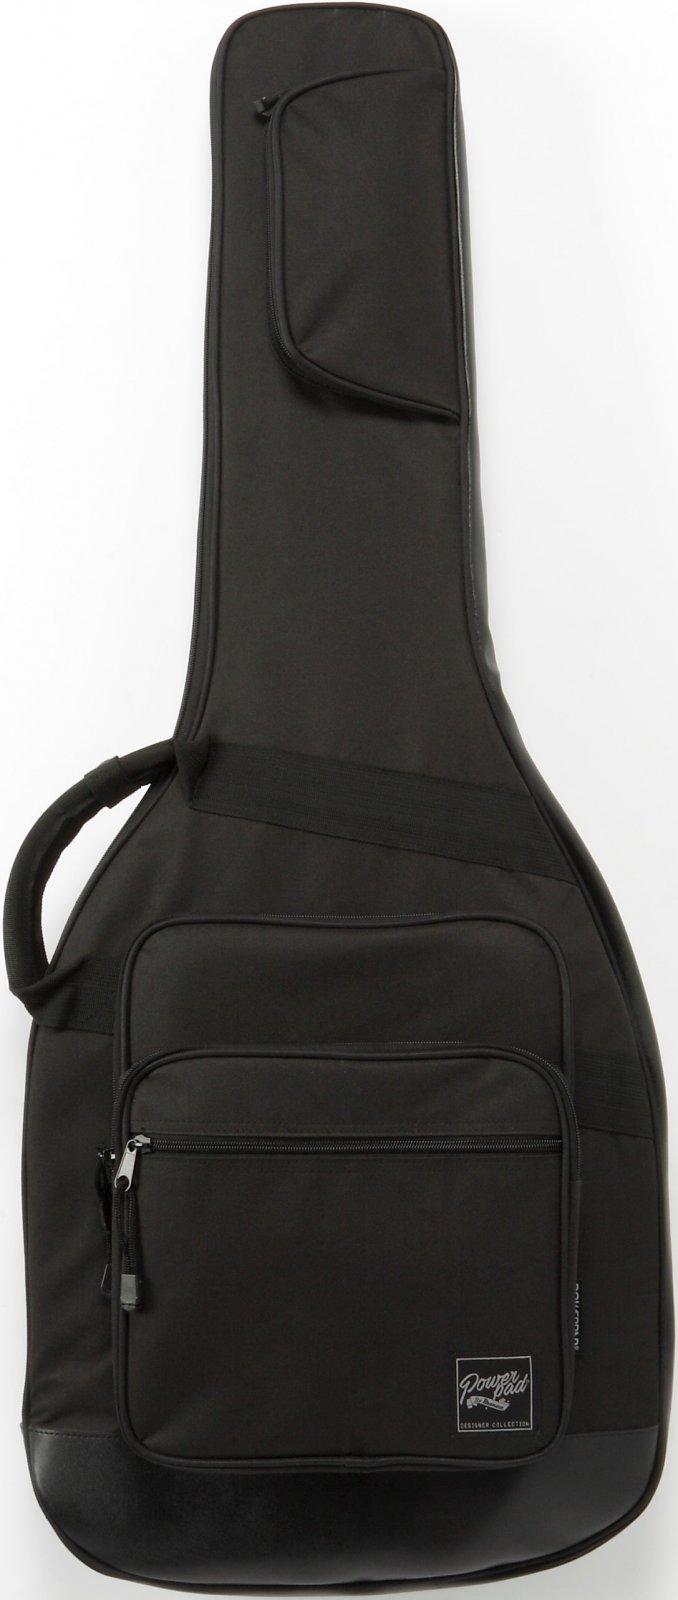 Ibanez IGB540 BK POWERPAD® gig bag for El. Guitar